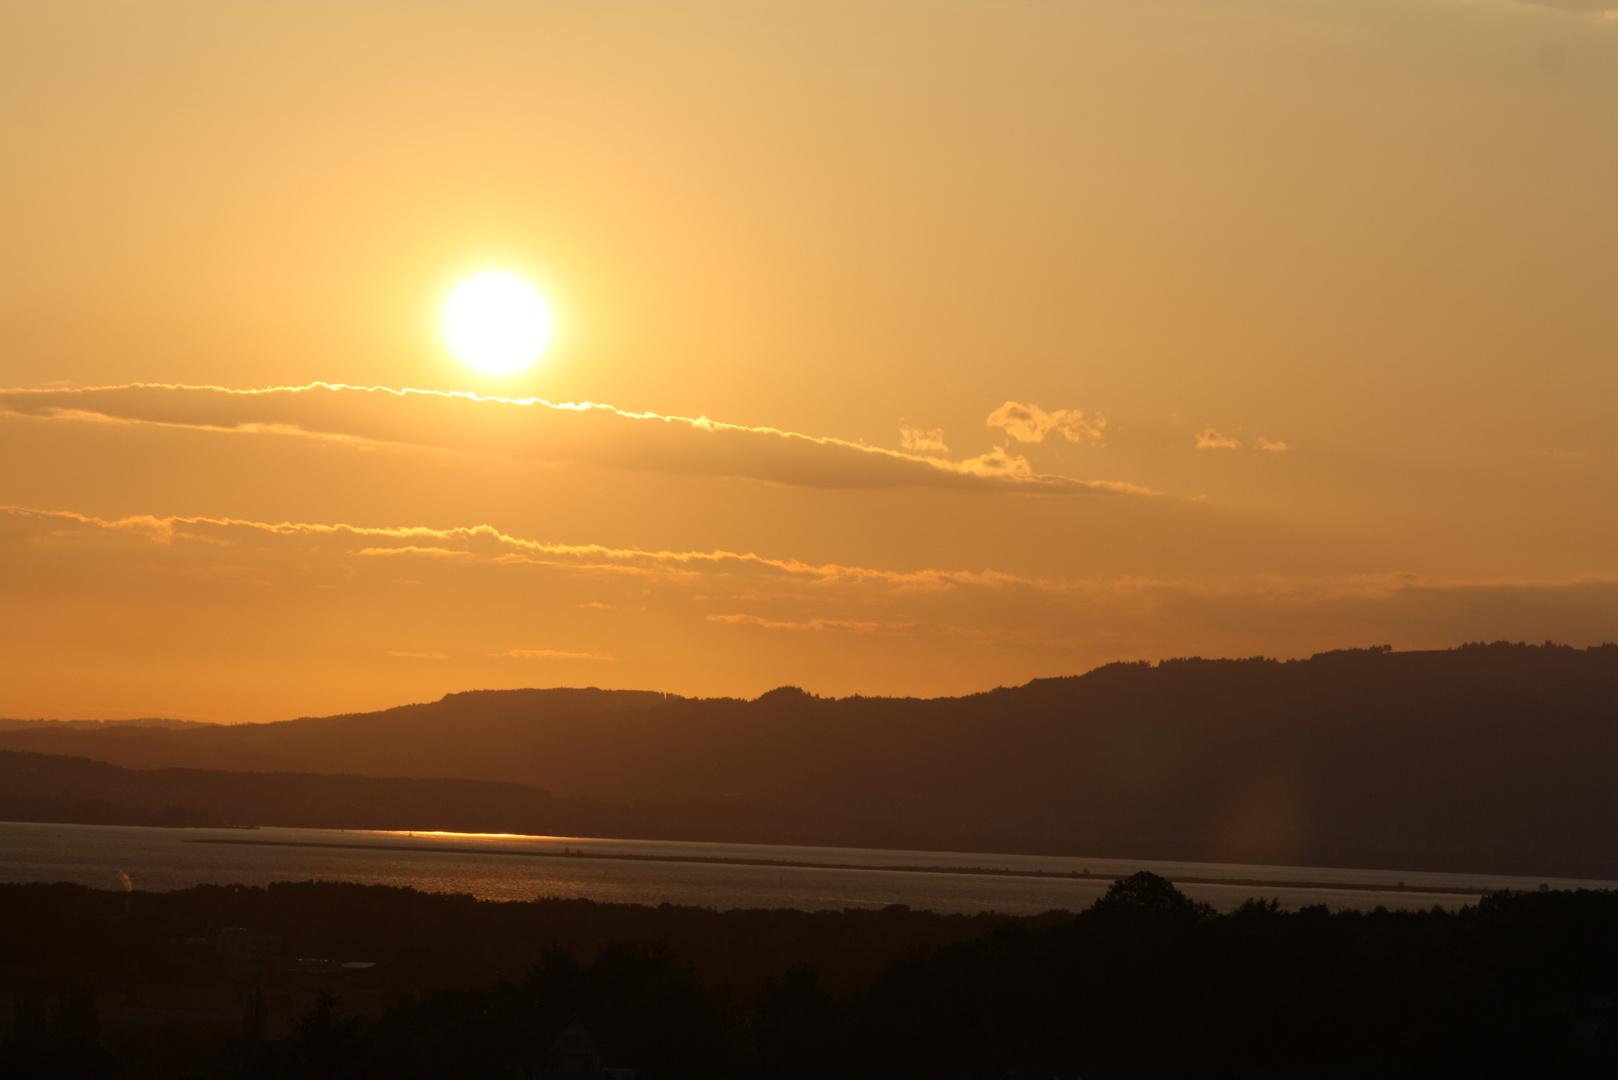 Sonnenaufgang 06:04 am 15.06.2014